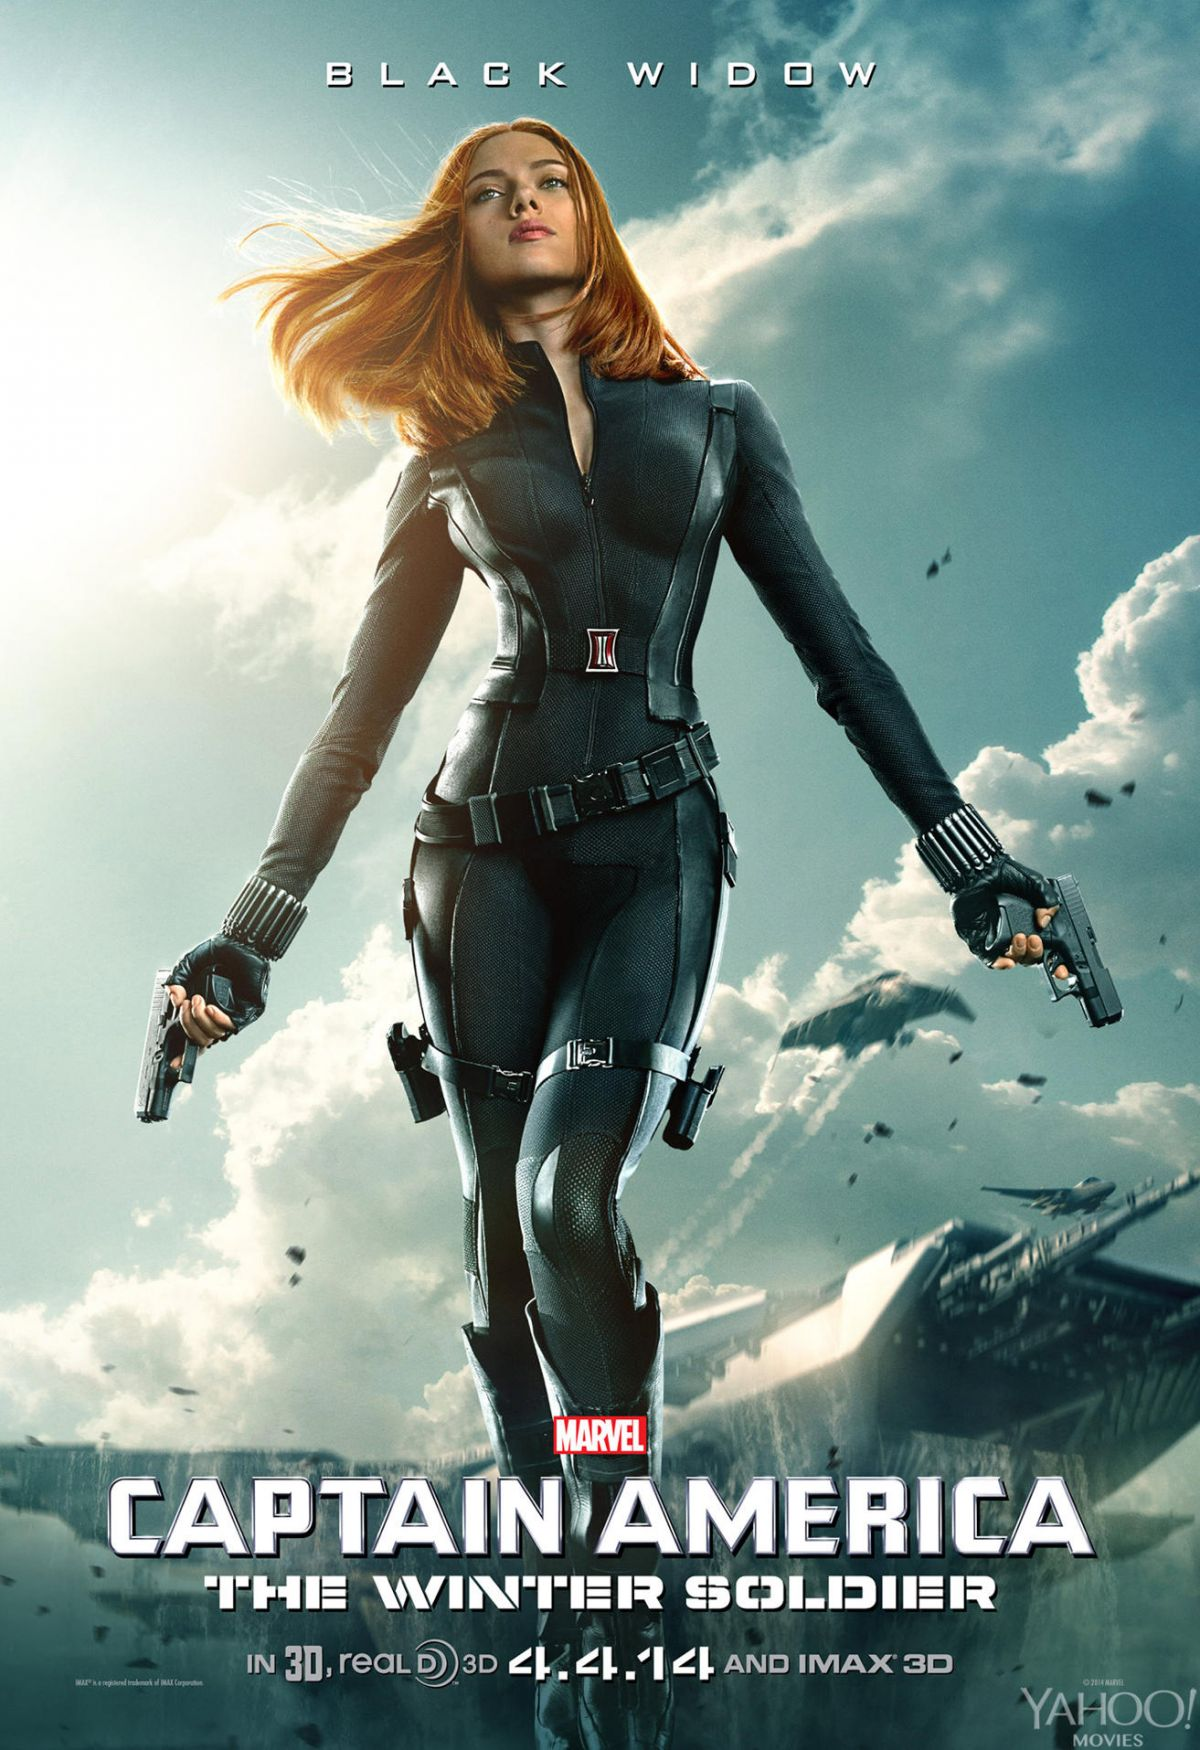 Scarlett johansson black widow poster - photo#3